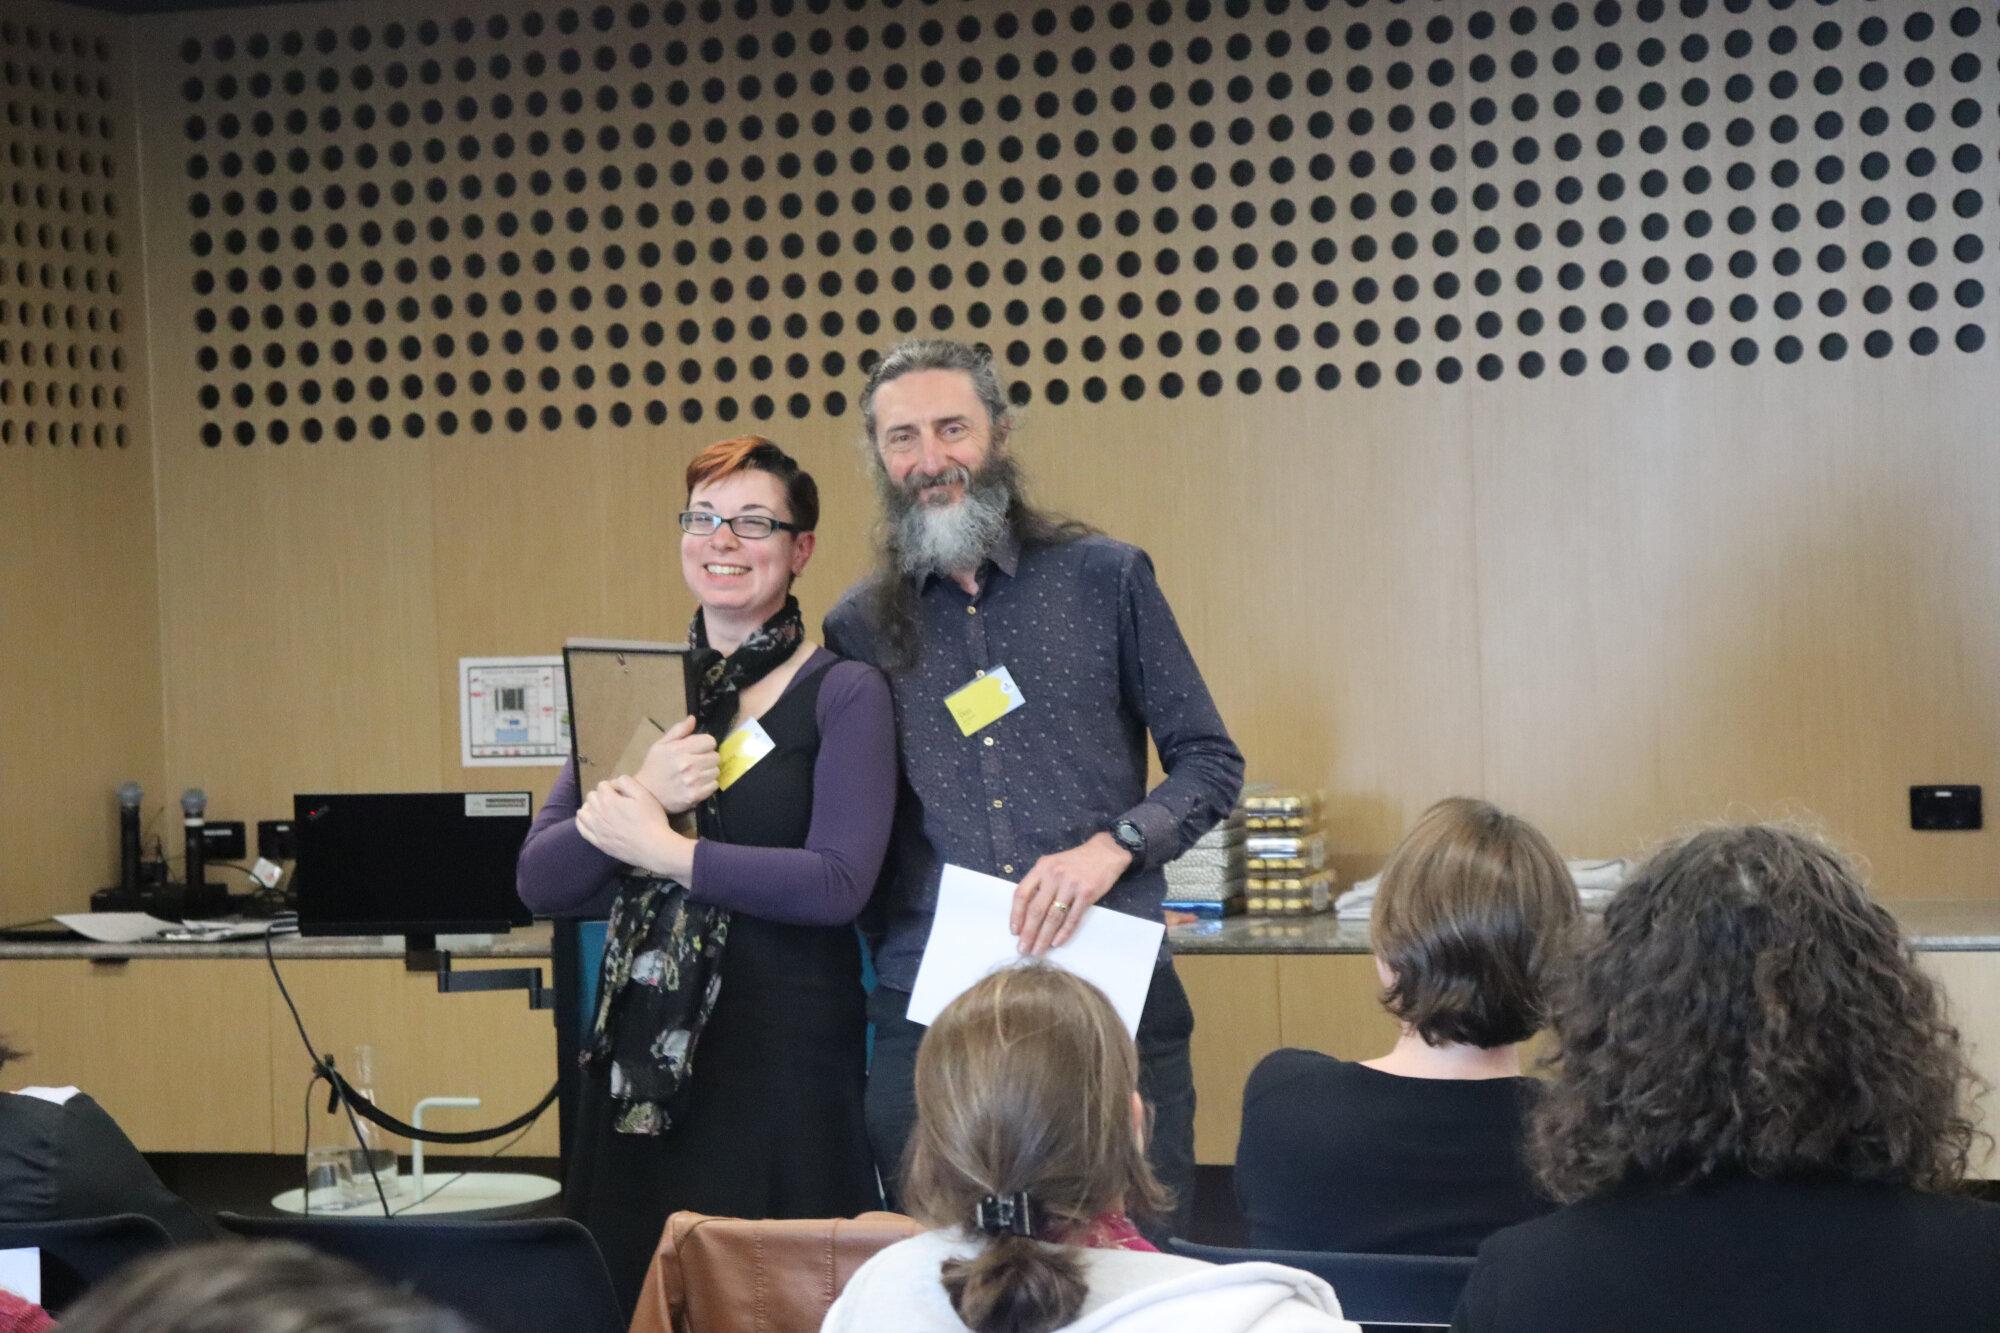 Katrina receiving her award from Prof. Don Driscoll